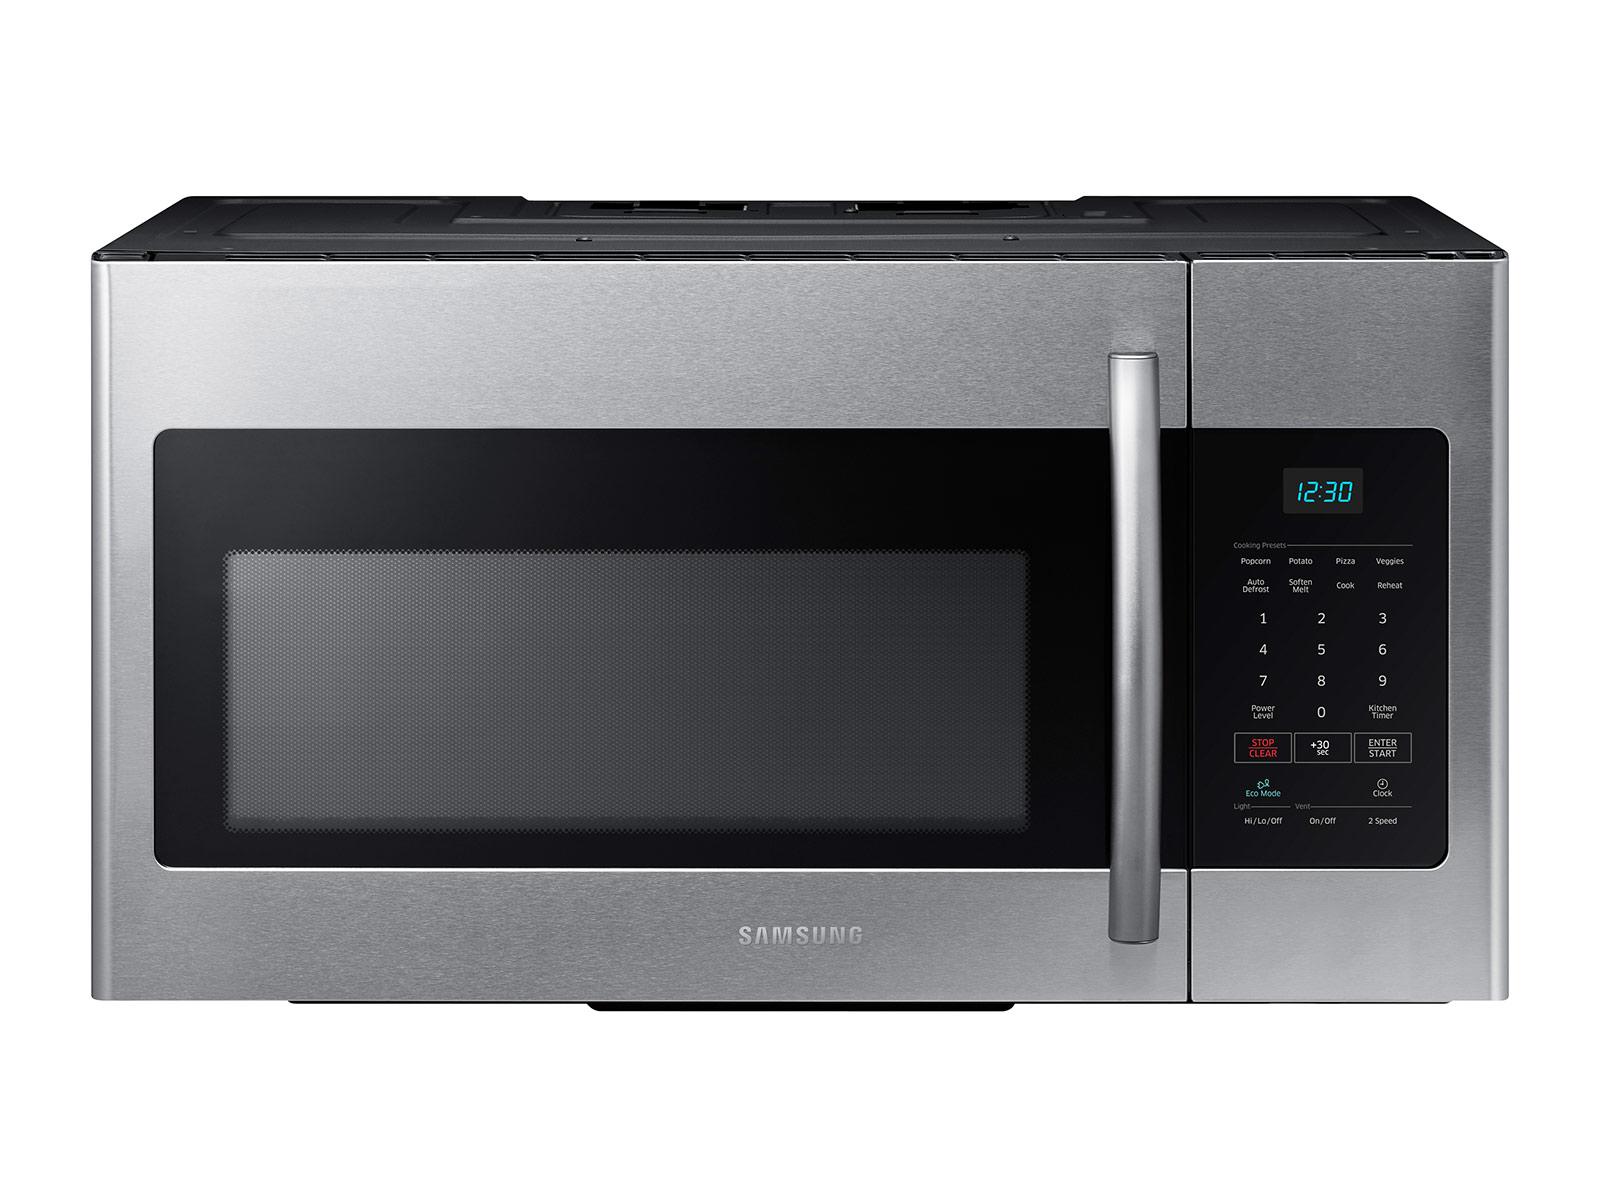 1 6 cu ft over the range microwave in fingerprint resistant stainless steel